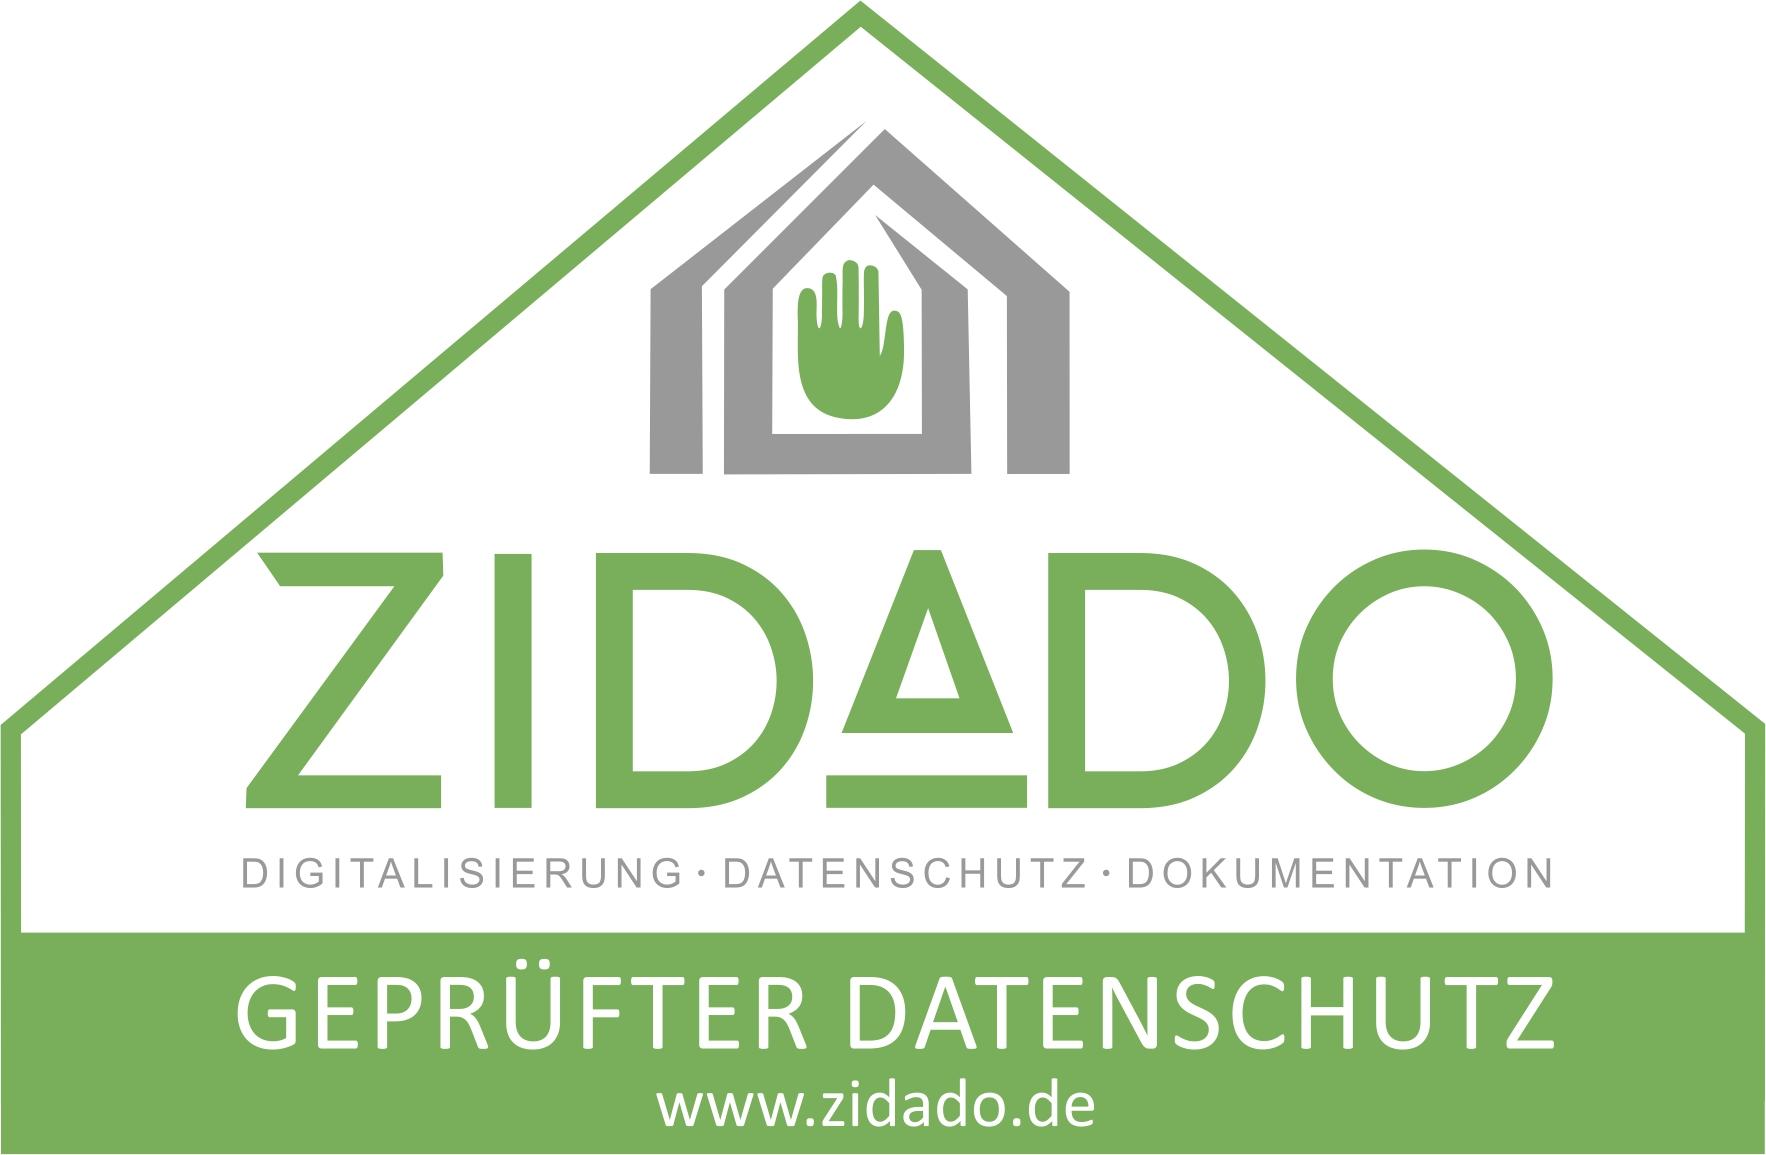 ZIDADO - Digitalisierung - Datenschutz - Dokumentation